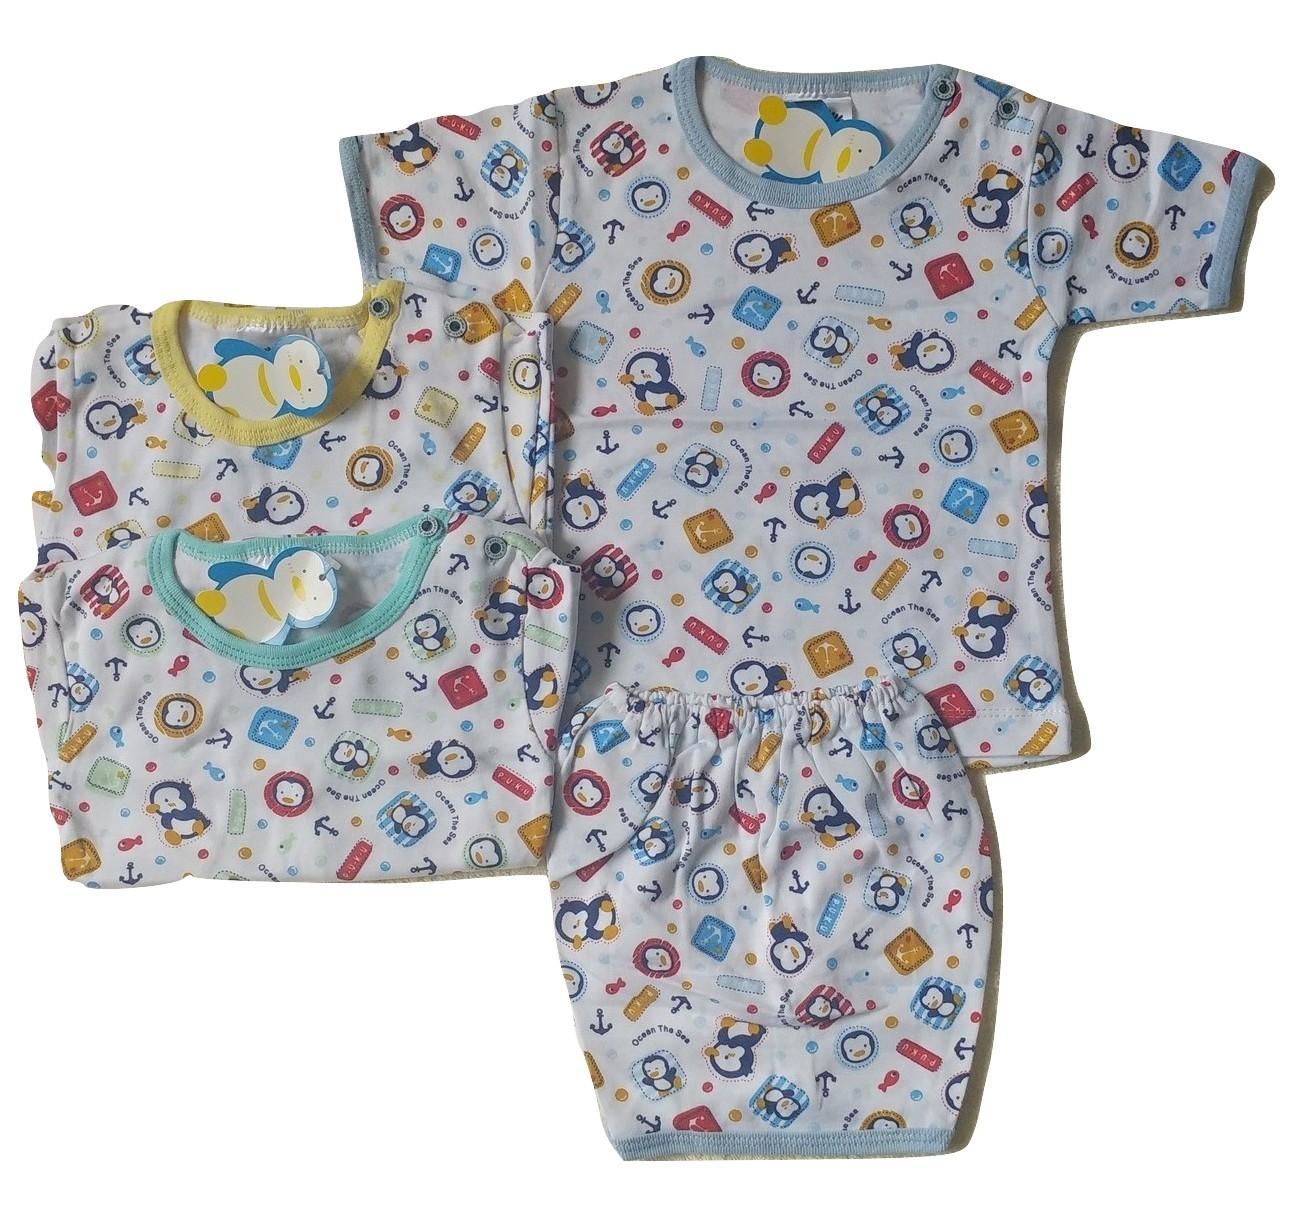 Jelova Angela Setelan Baju Pendek Baby Bayi PUKU 6-12 Months - Mixcolours